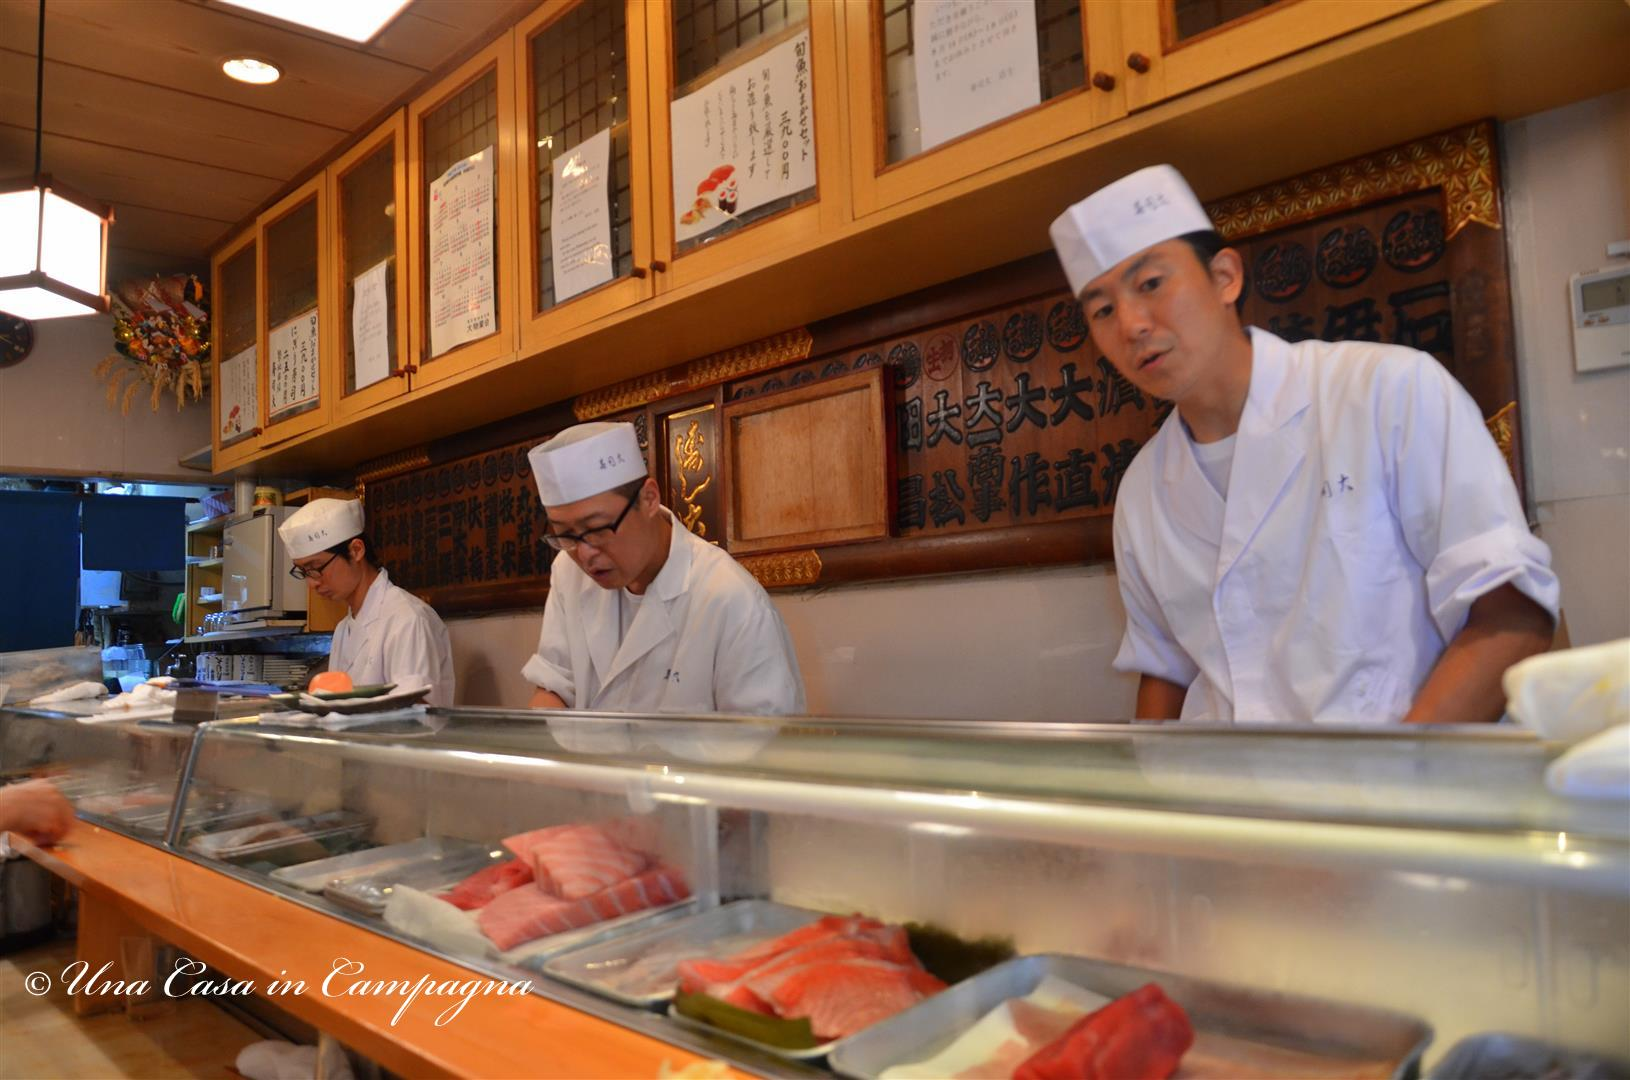 2.Colazione da Sushi Dai - 10 cose da fare a Tokyo - Una casa in campagna